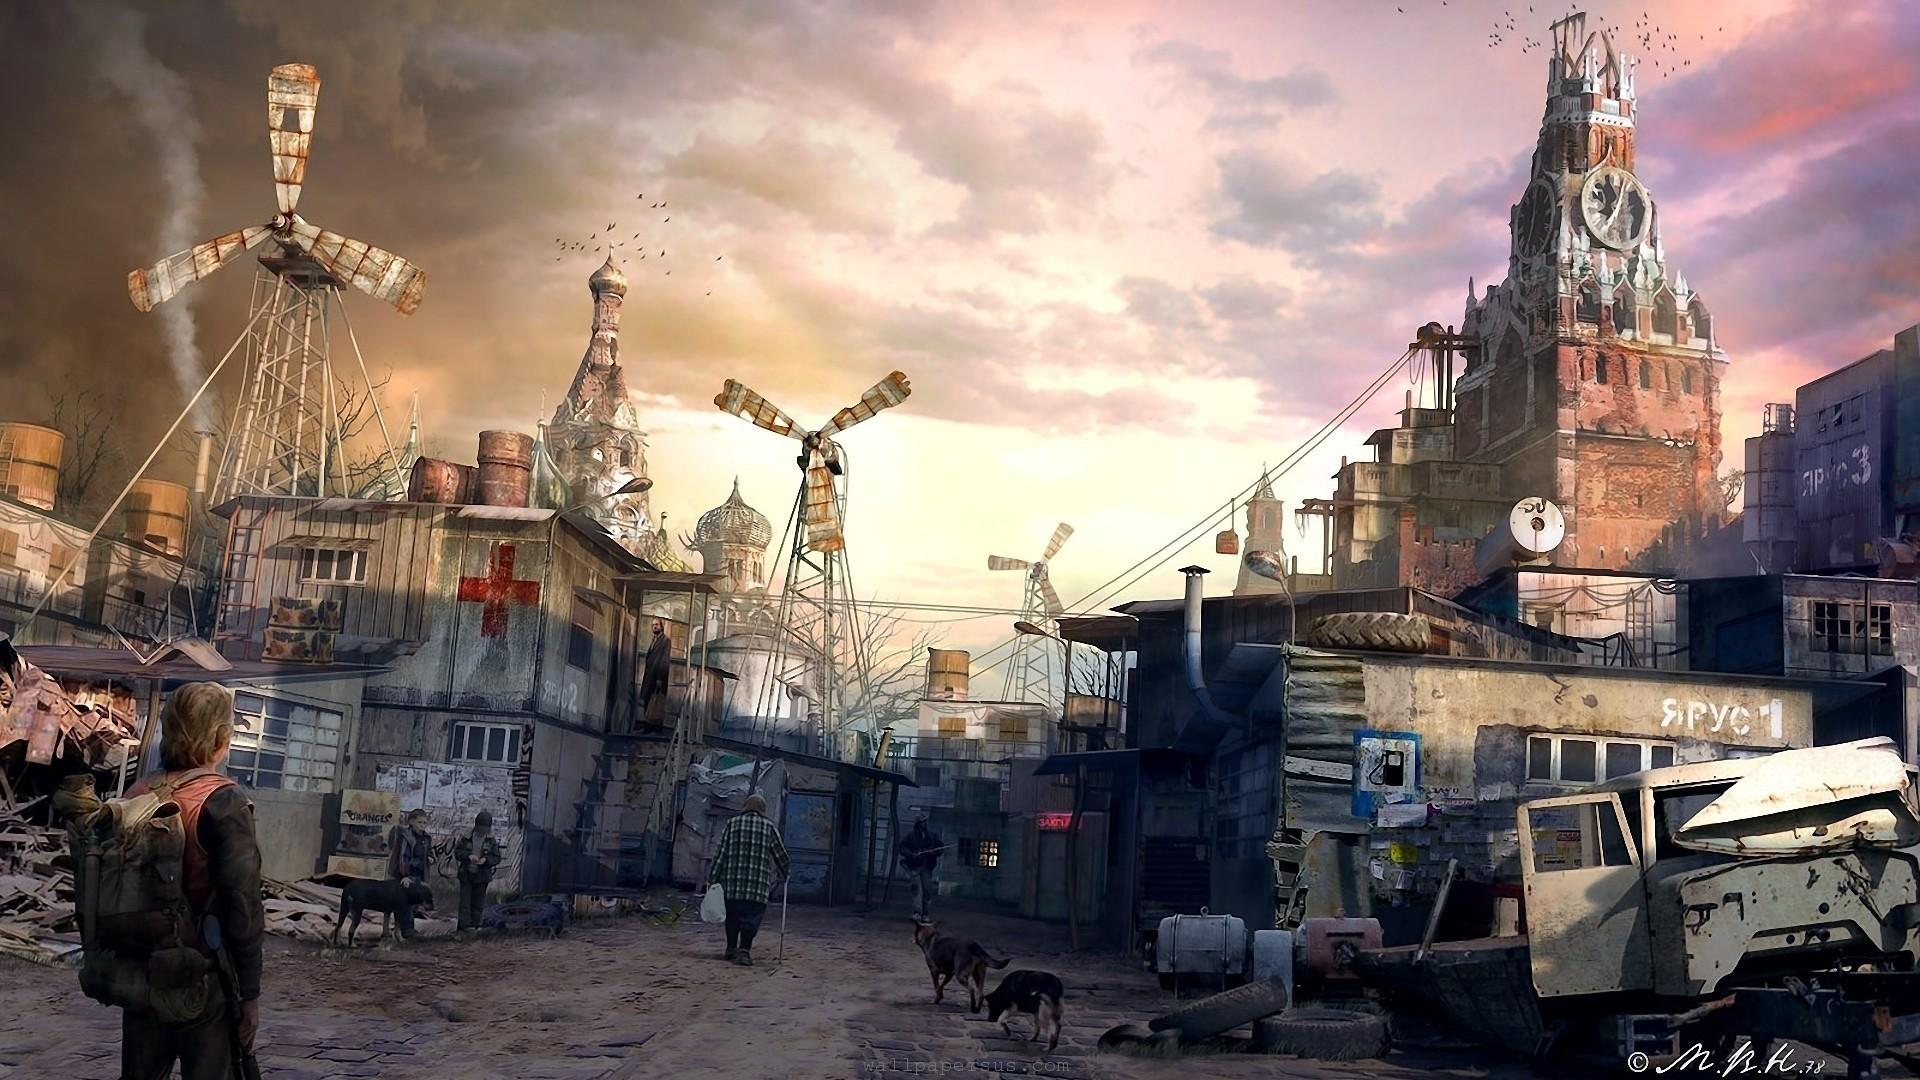 Le Quartier Administratif Ruins-post-apocalyptic-russia-fantasy-art-moscow-artwork-kremlin-cities-postapocalipse